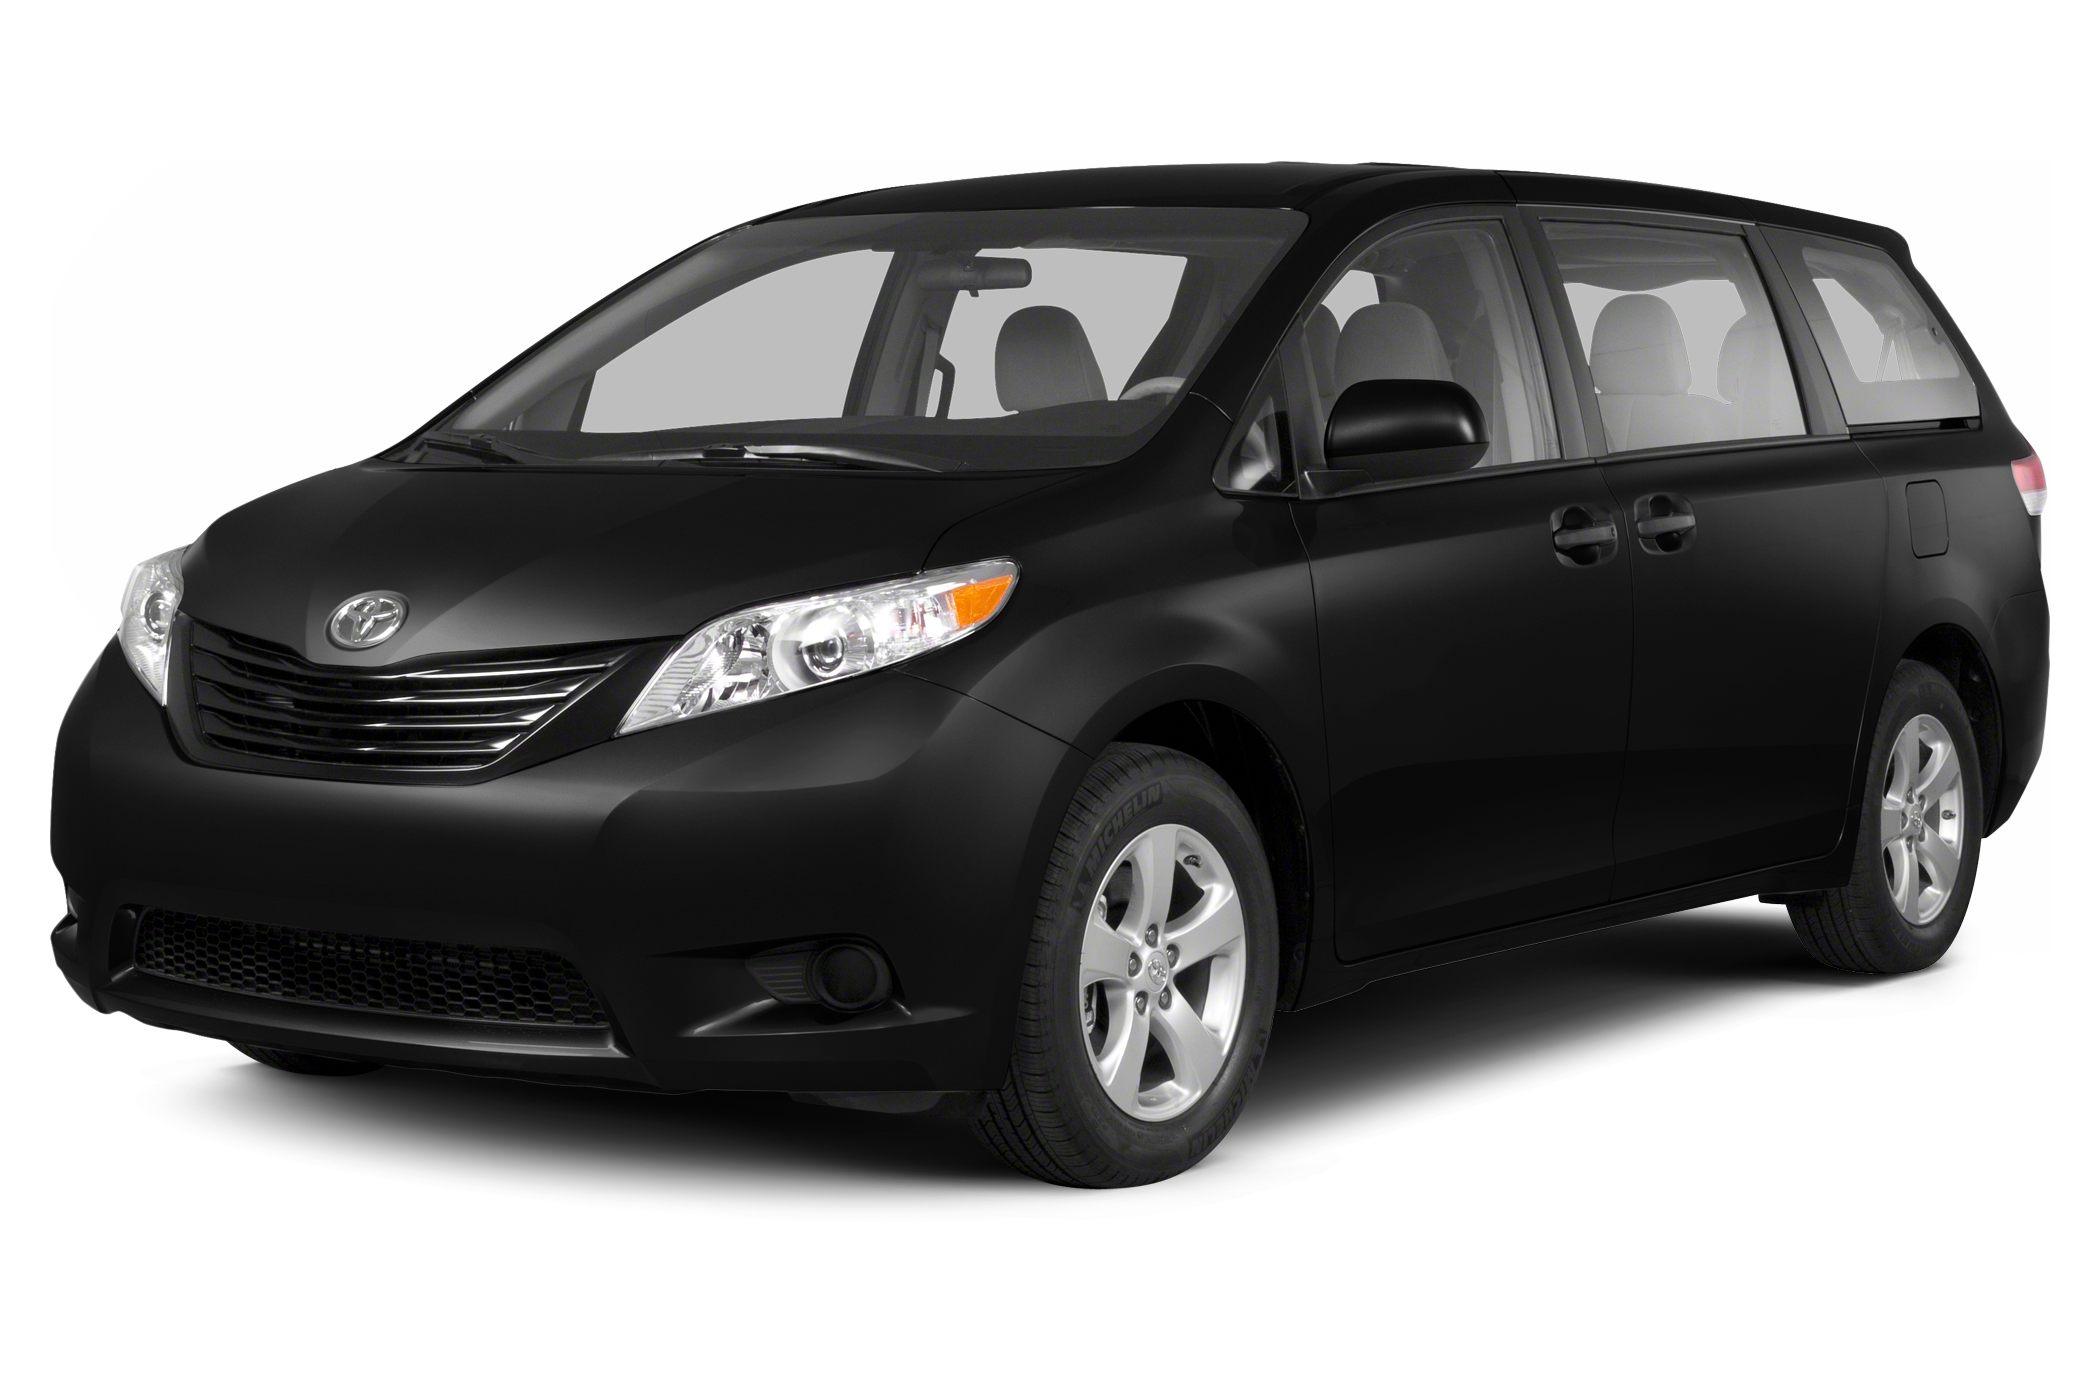 2013 Toyota Sienna XLE V6 8 Passenger 4dr Front wheel Drive